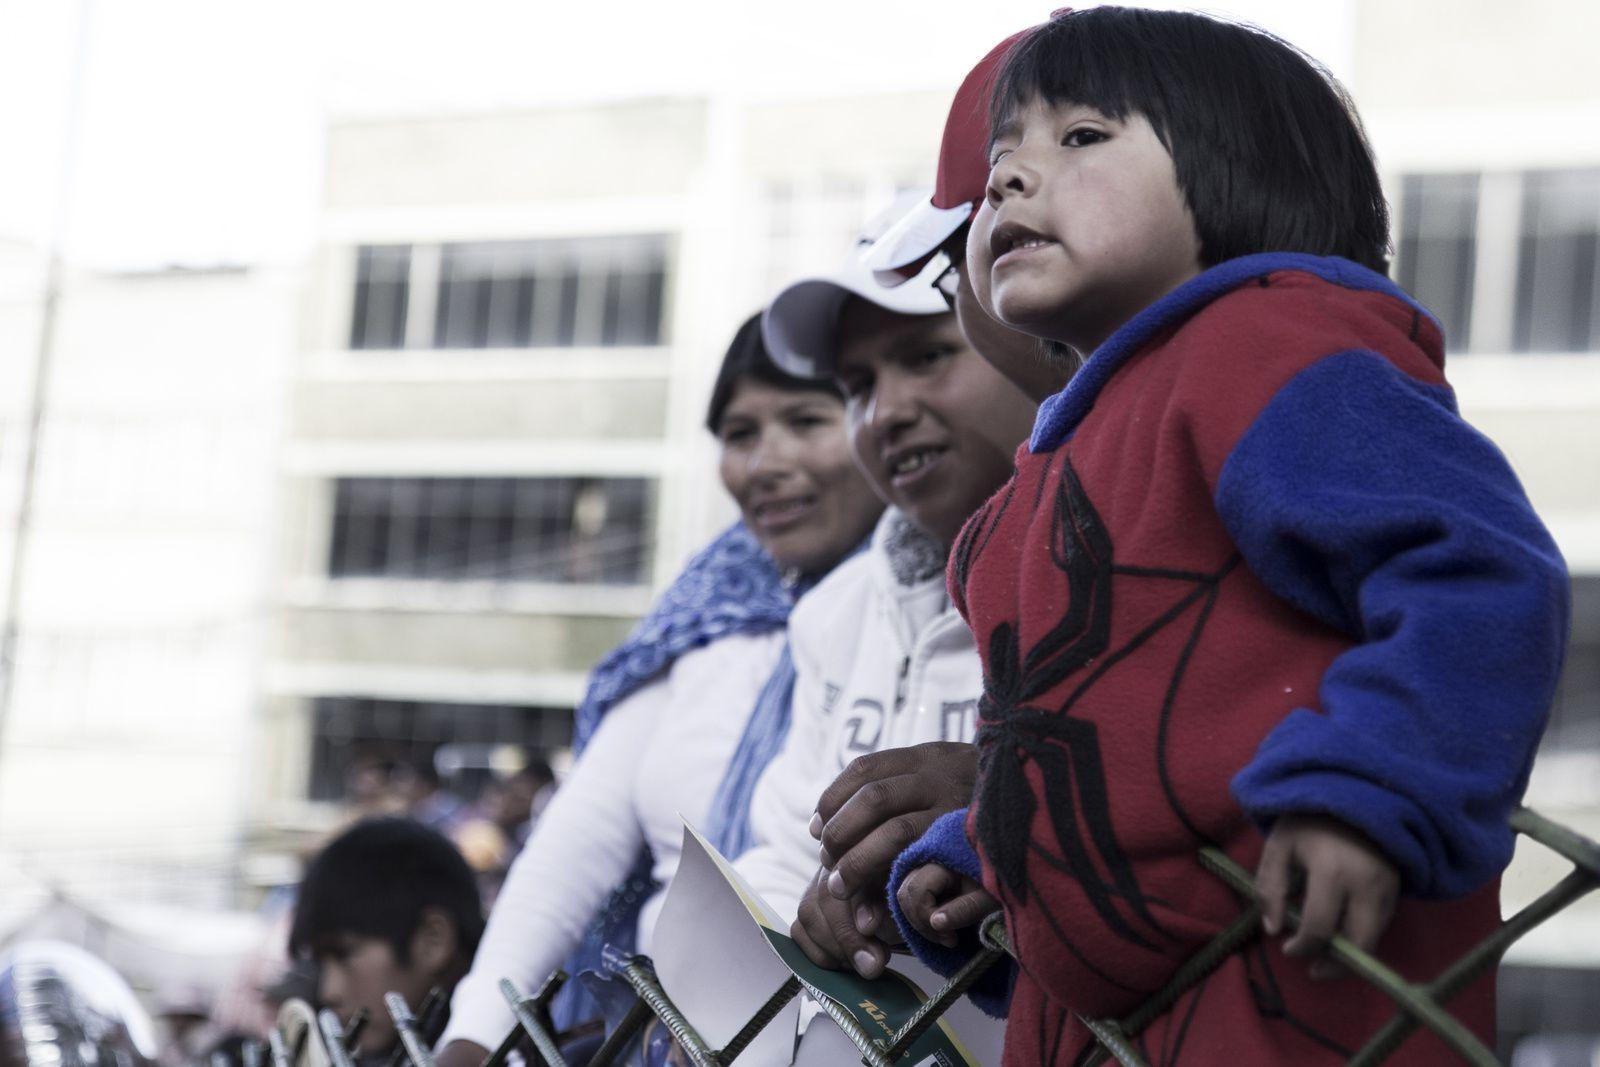 GRAN PODER - La Paz Carnaval - Bolivia